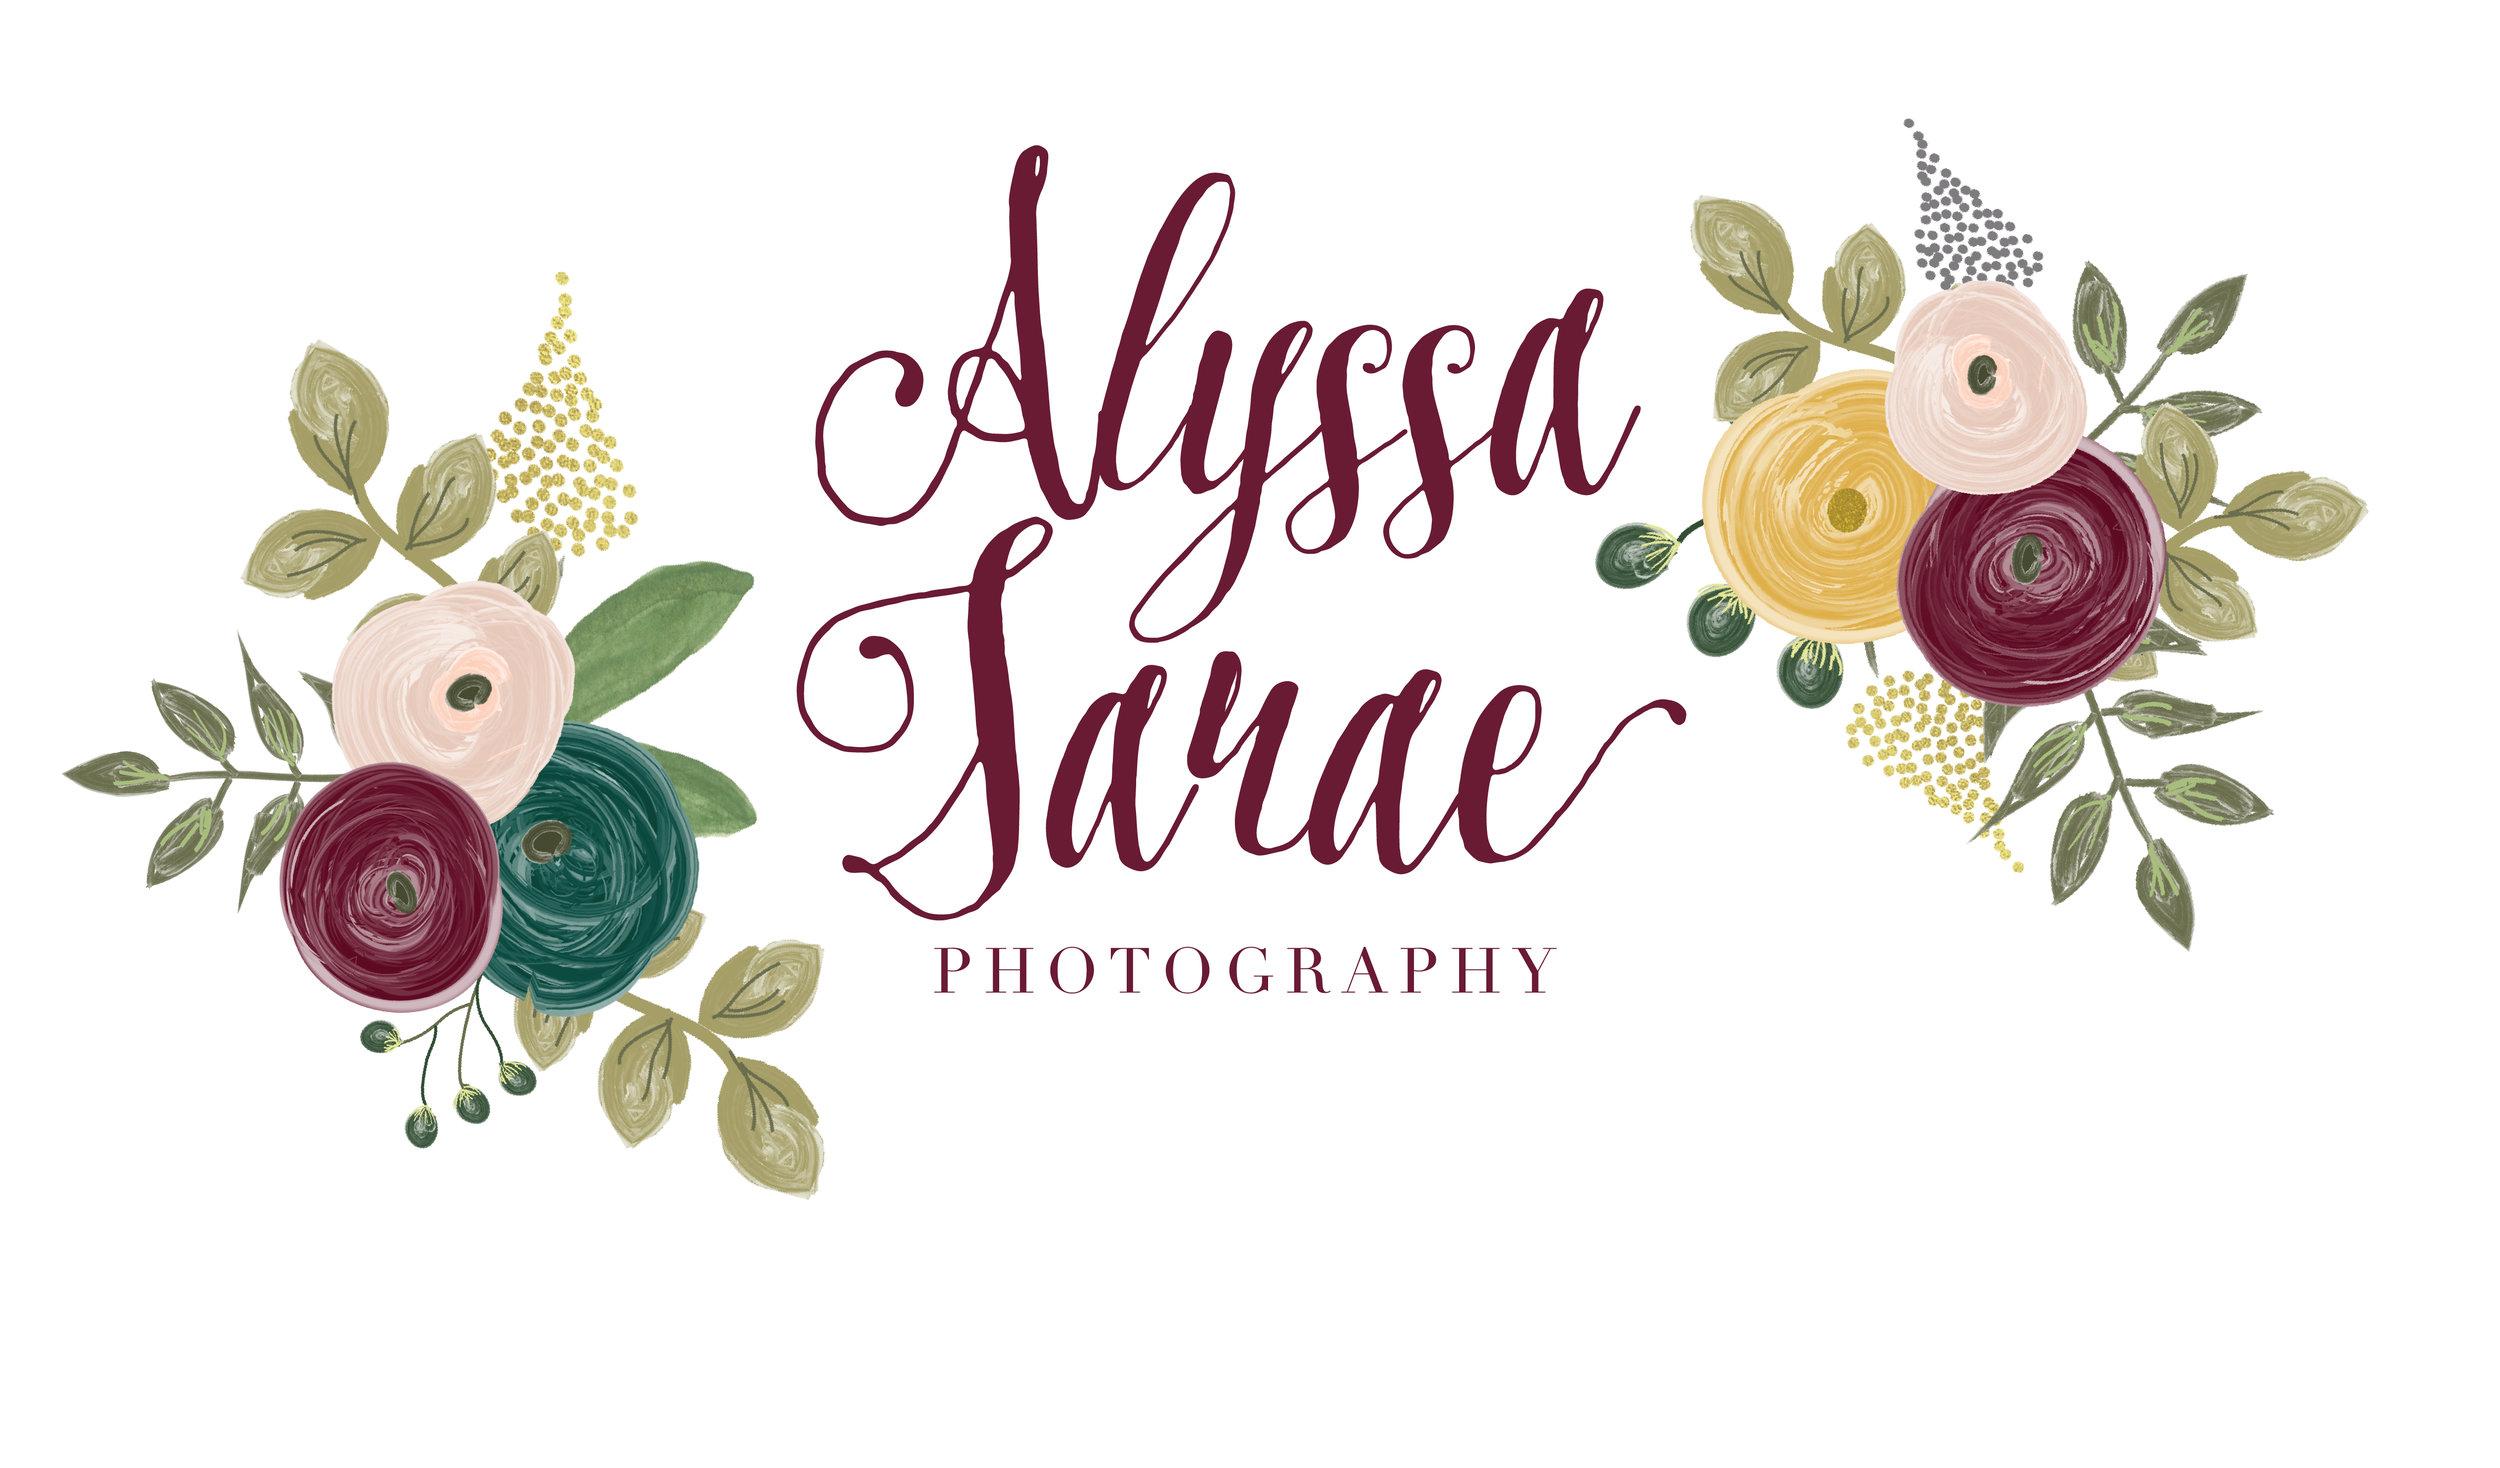 Alyssa Jarae Logo with Accents.jpg